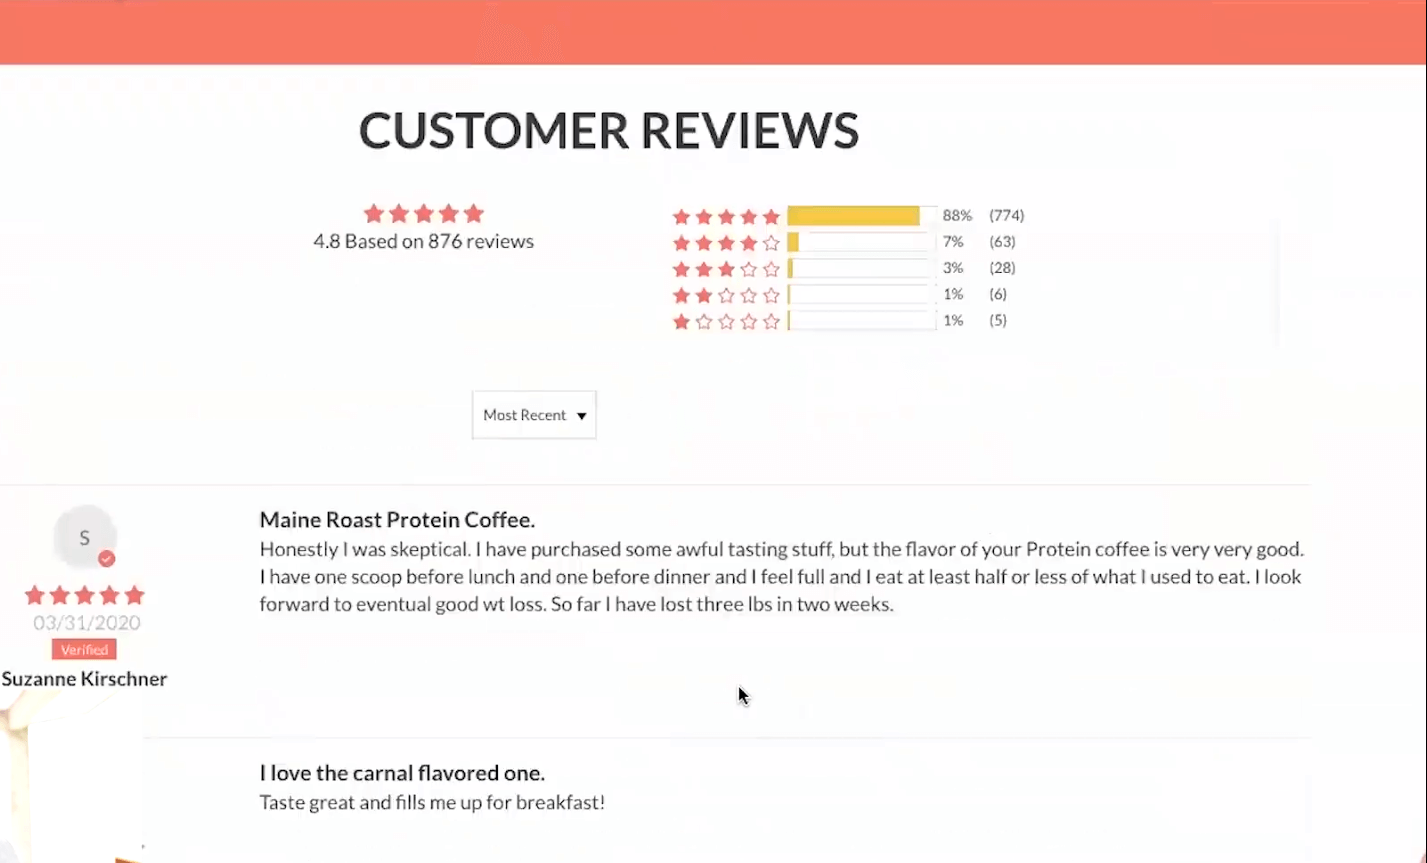 maine roast customer reviews